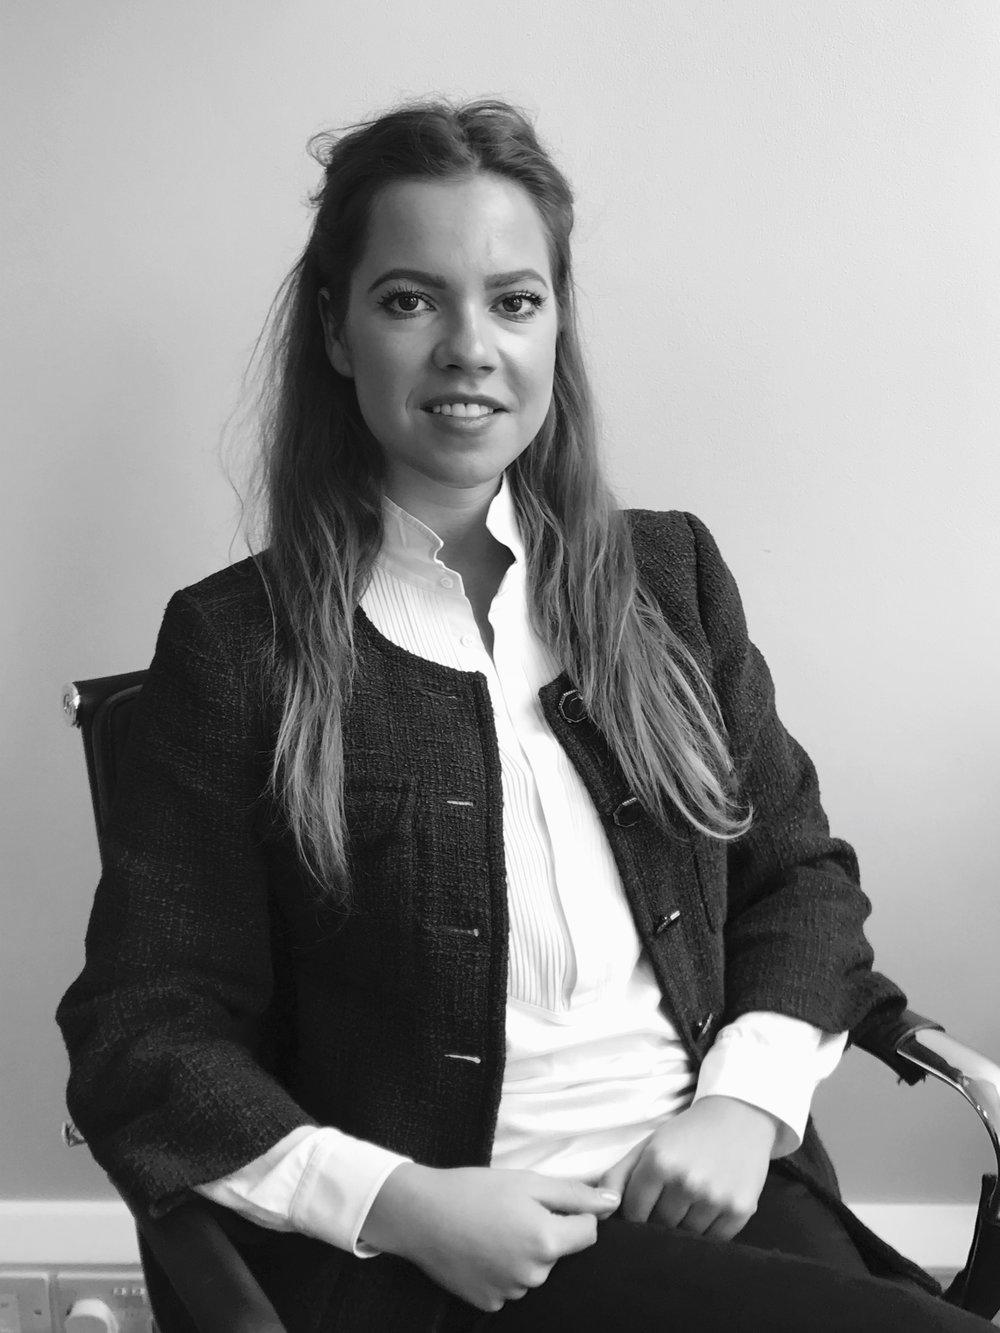 Marie-Julie Gheysens   Investment Analyst  Tel: +44 (0) 7584 097366  Email:  Mariejulie@sacopropertygroup.com